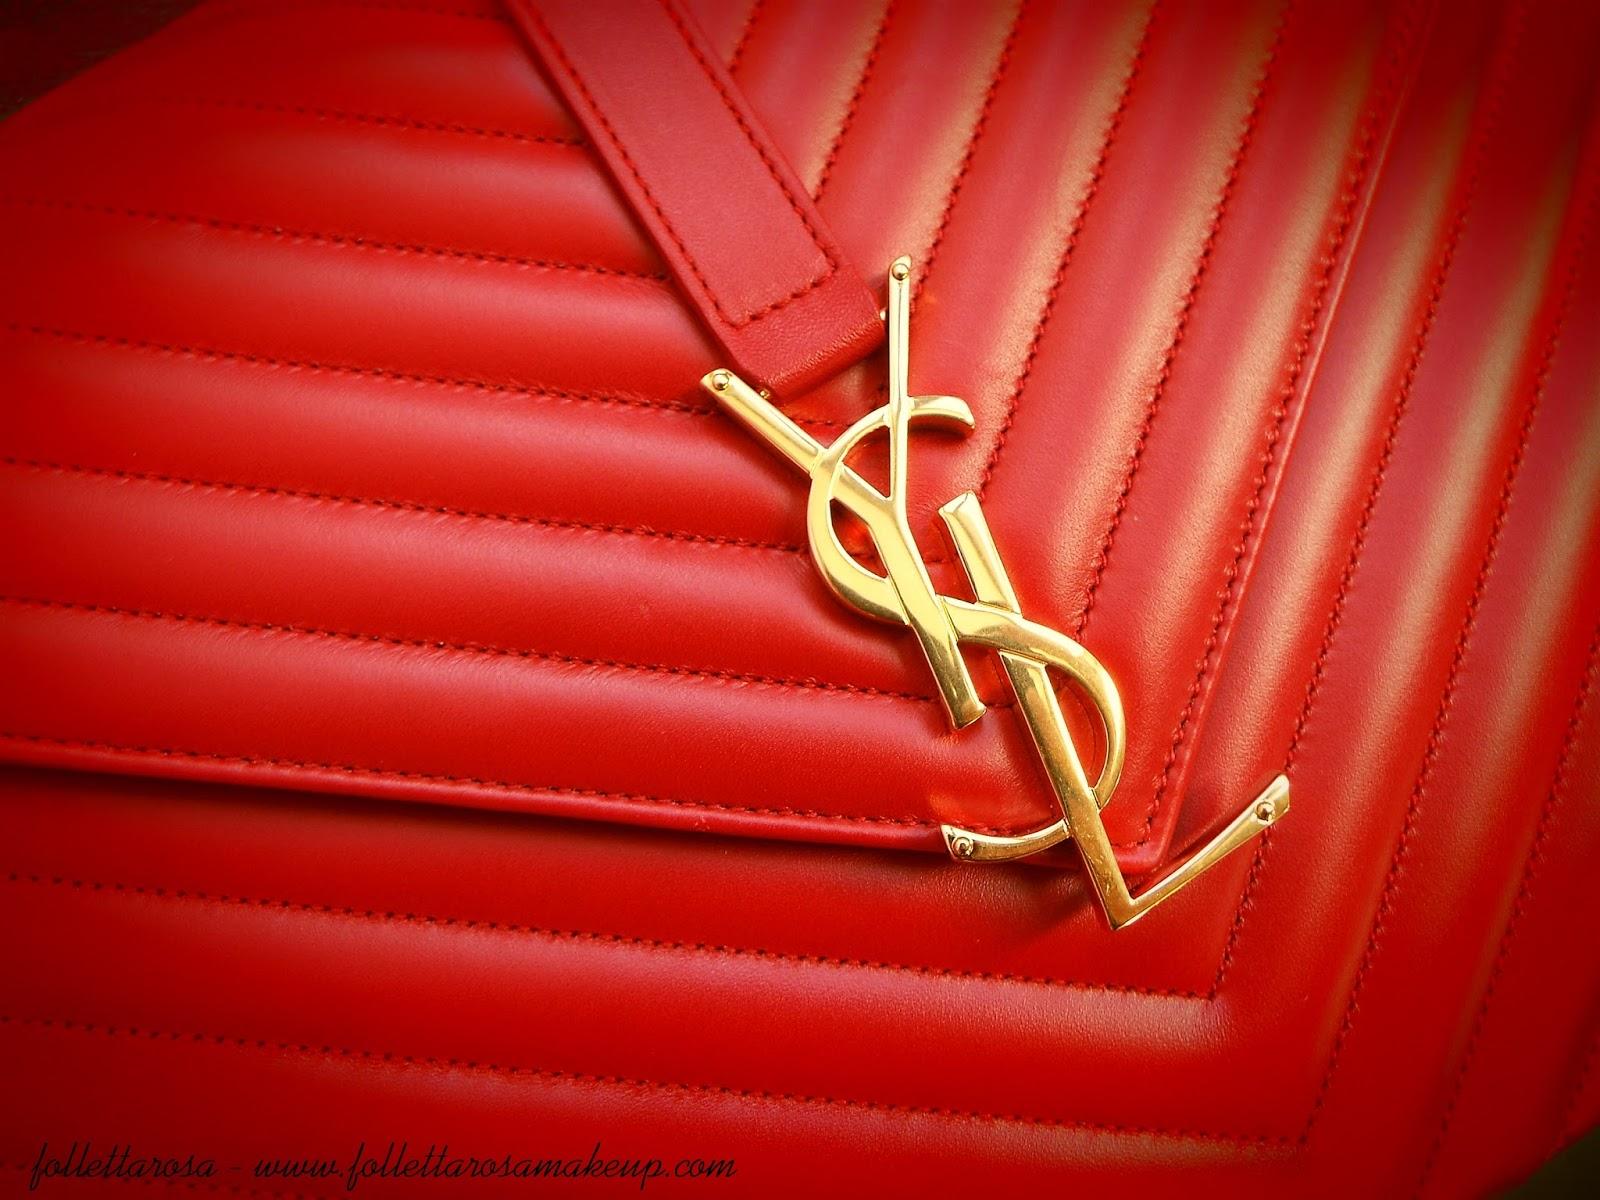 monogram ysl matelasse rossa